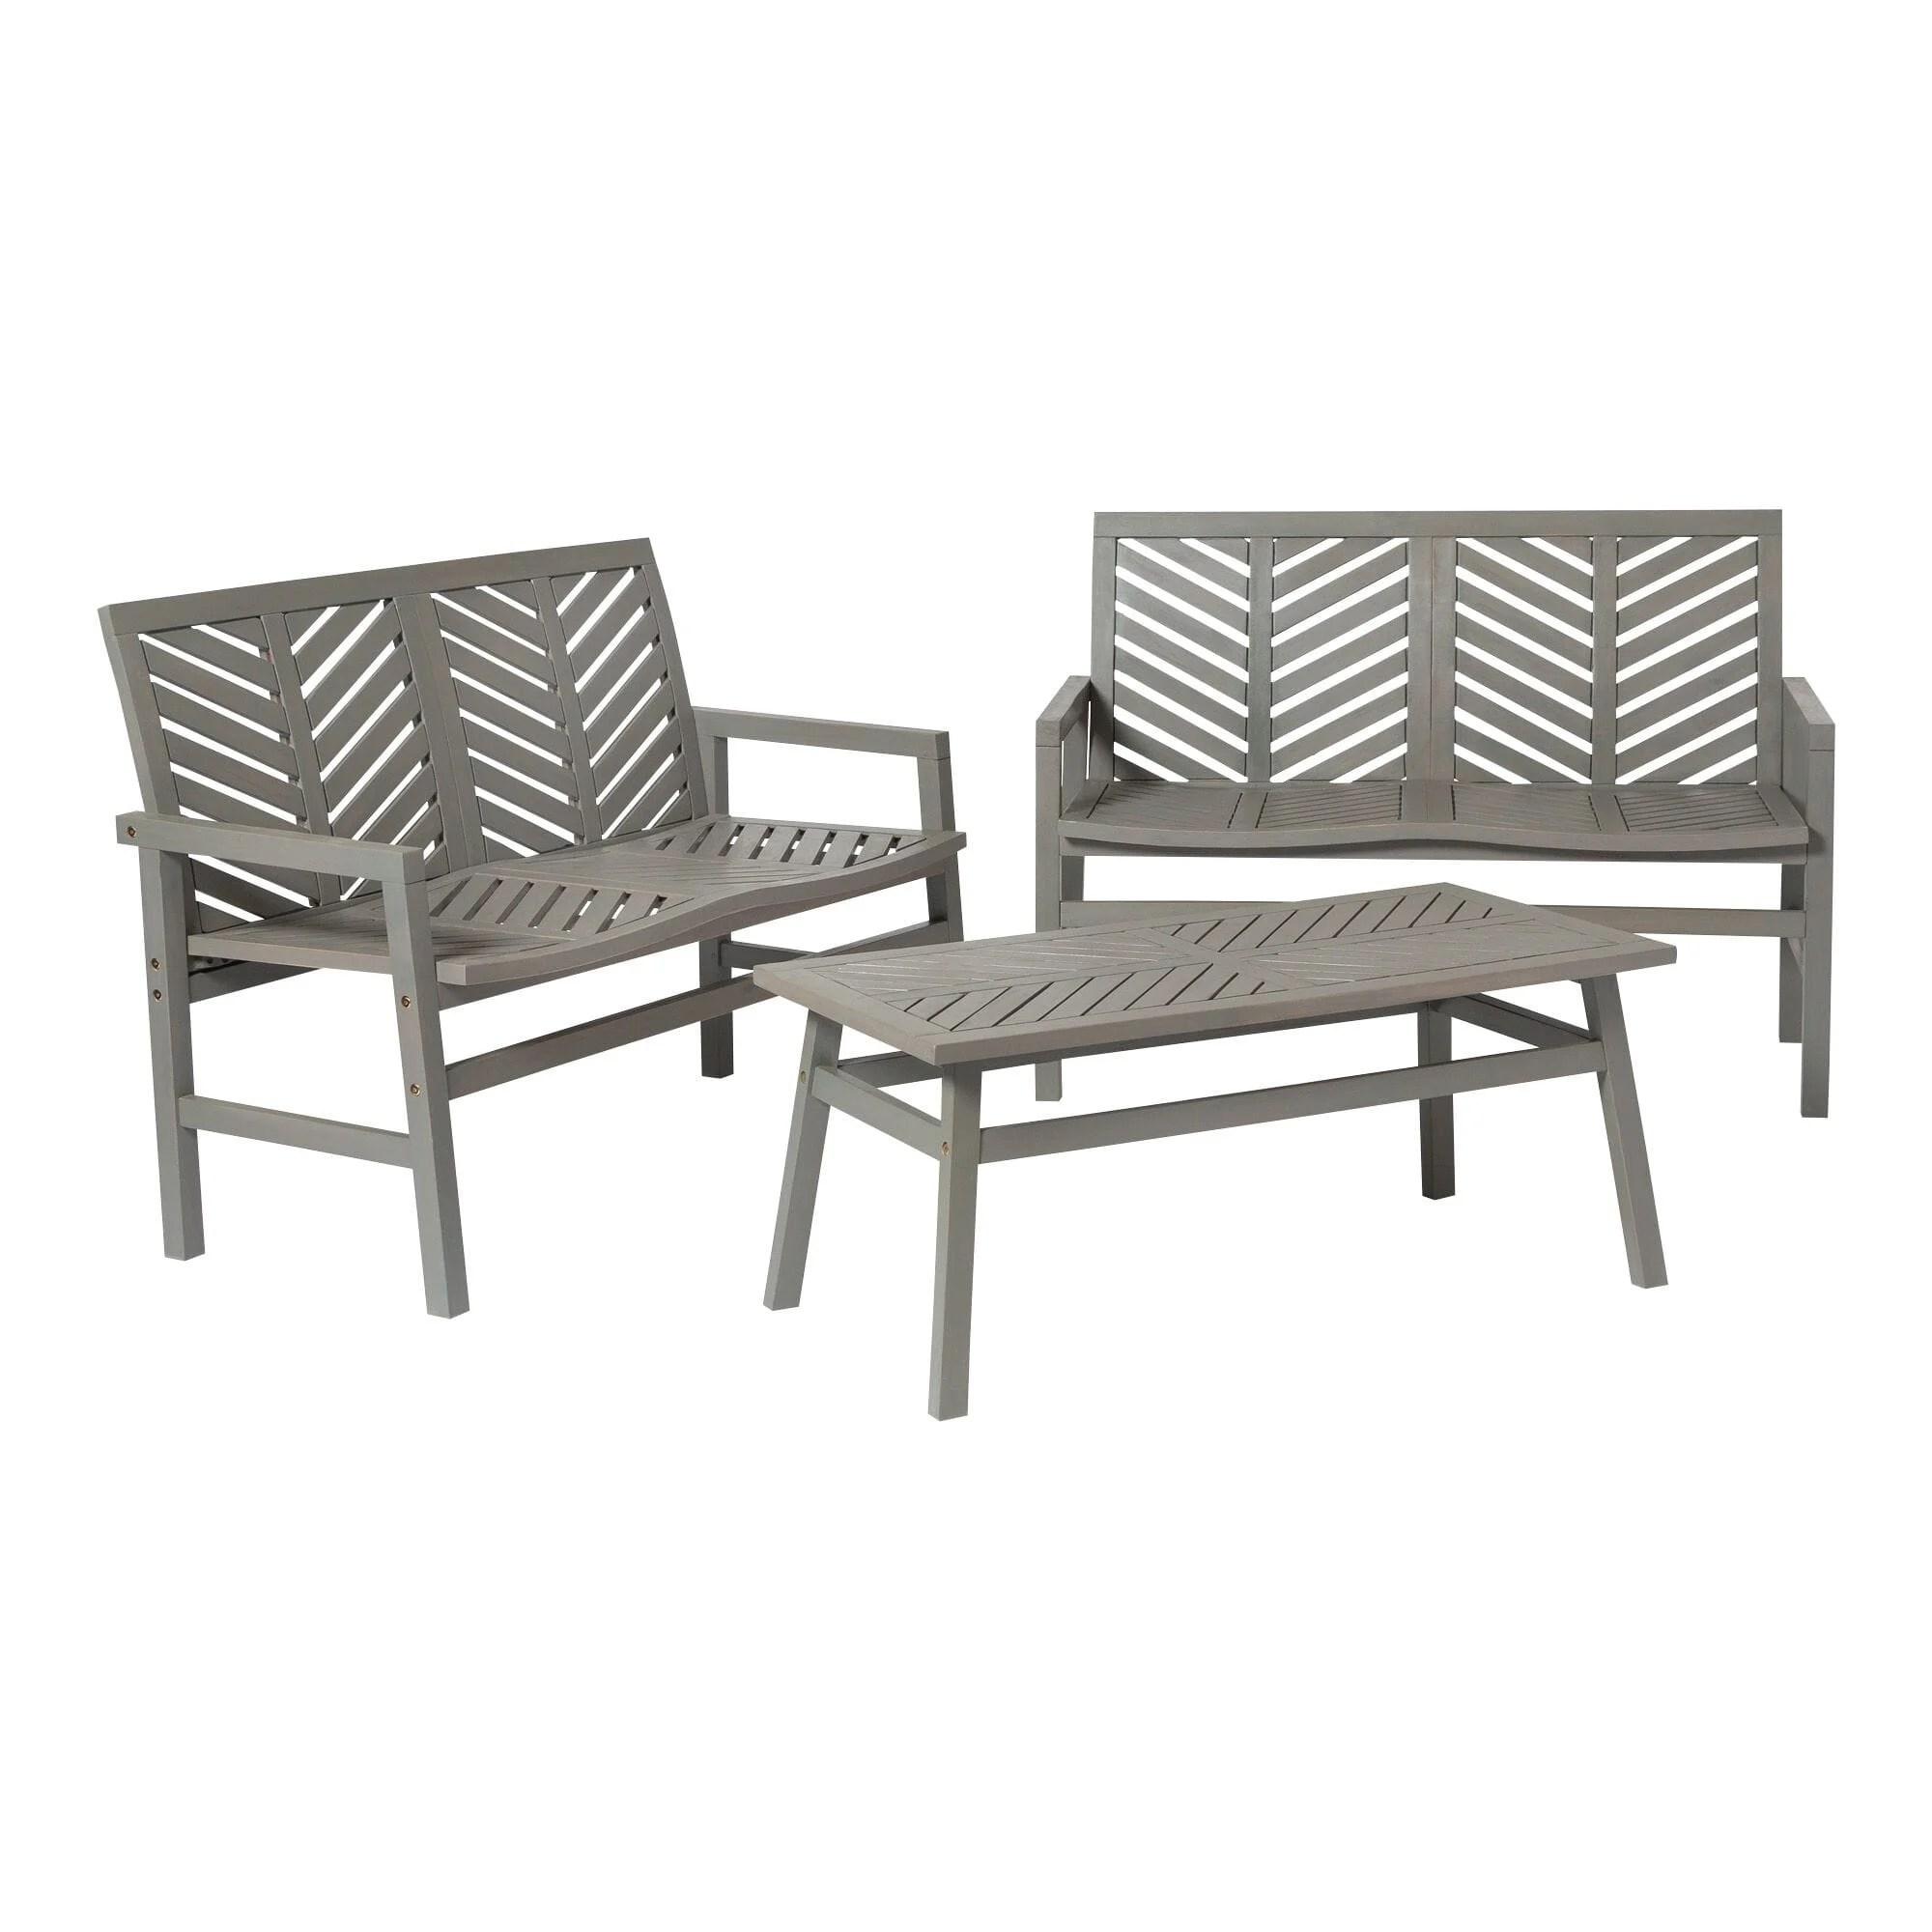 3 piece chevron outdoor patio loveseat chat set grey wash by walker edison